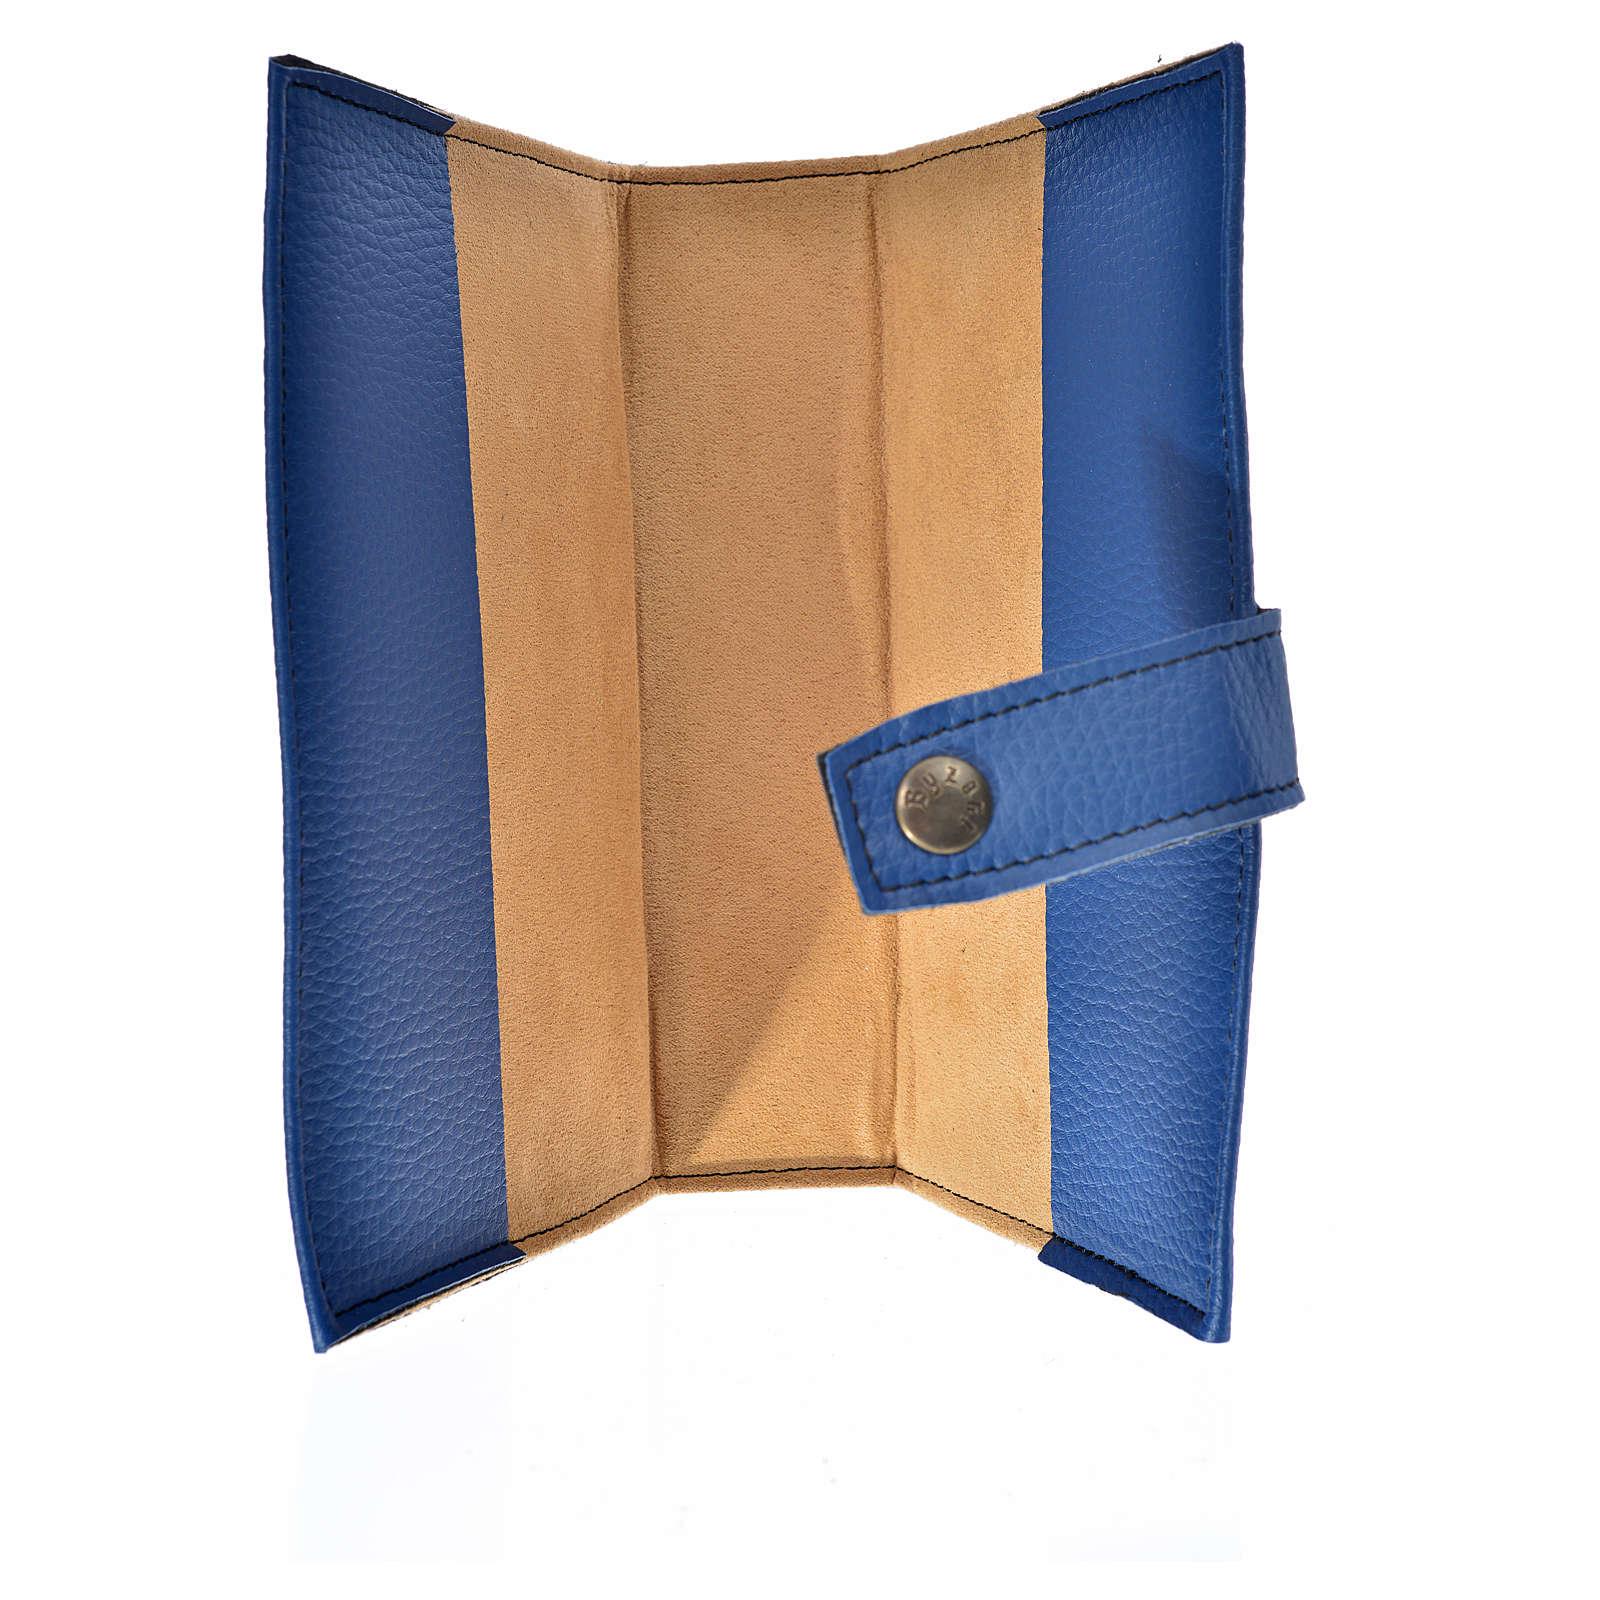 KIKO Leather Elphant Book Mark Dark Blue